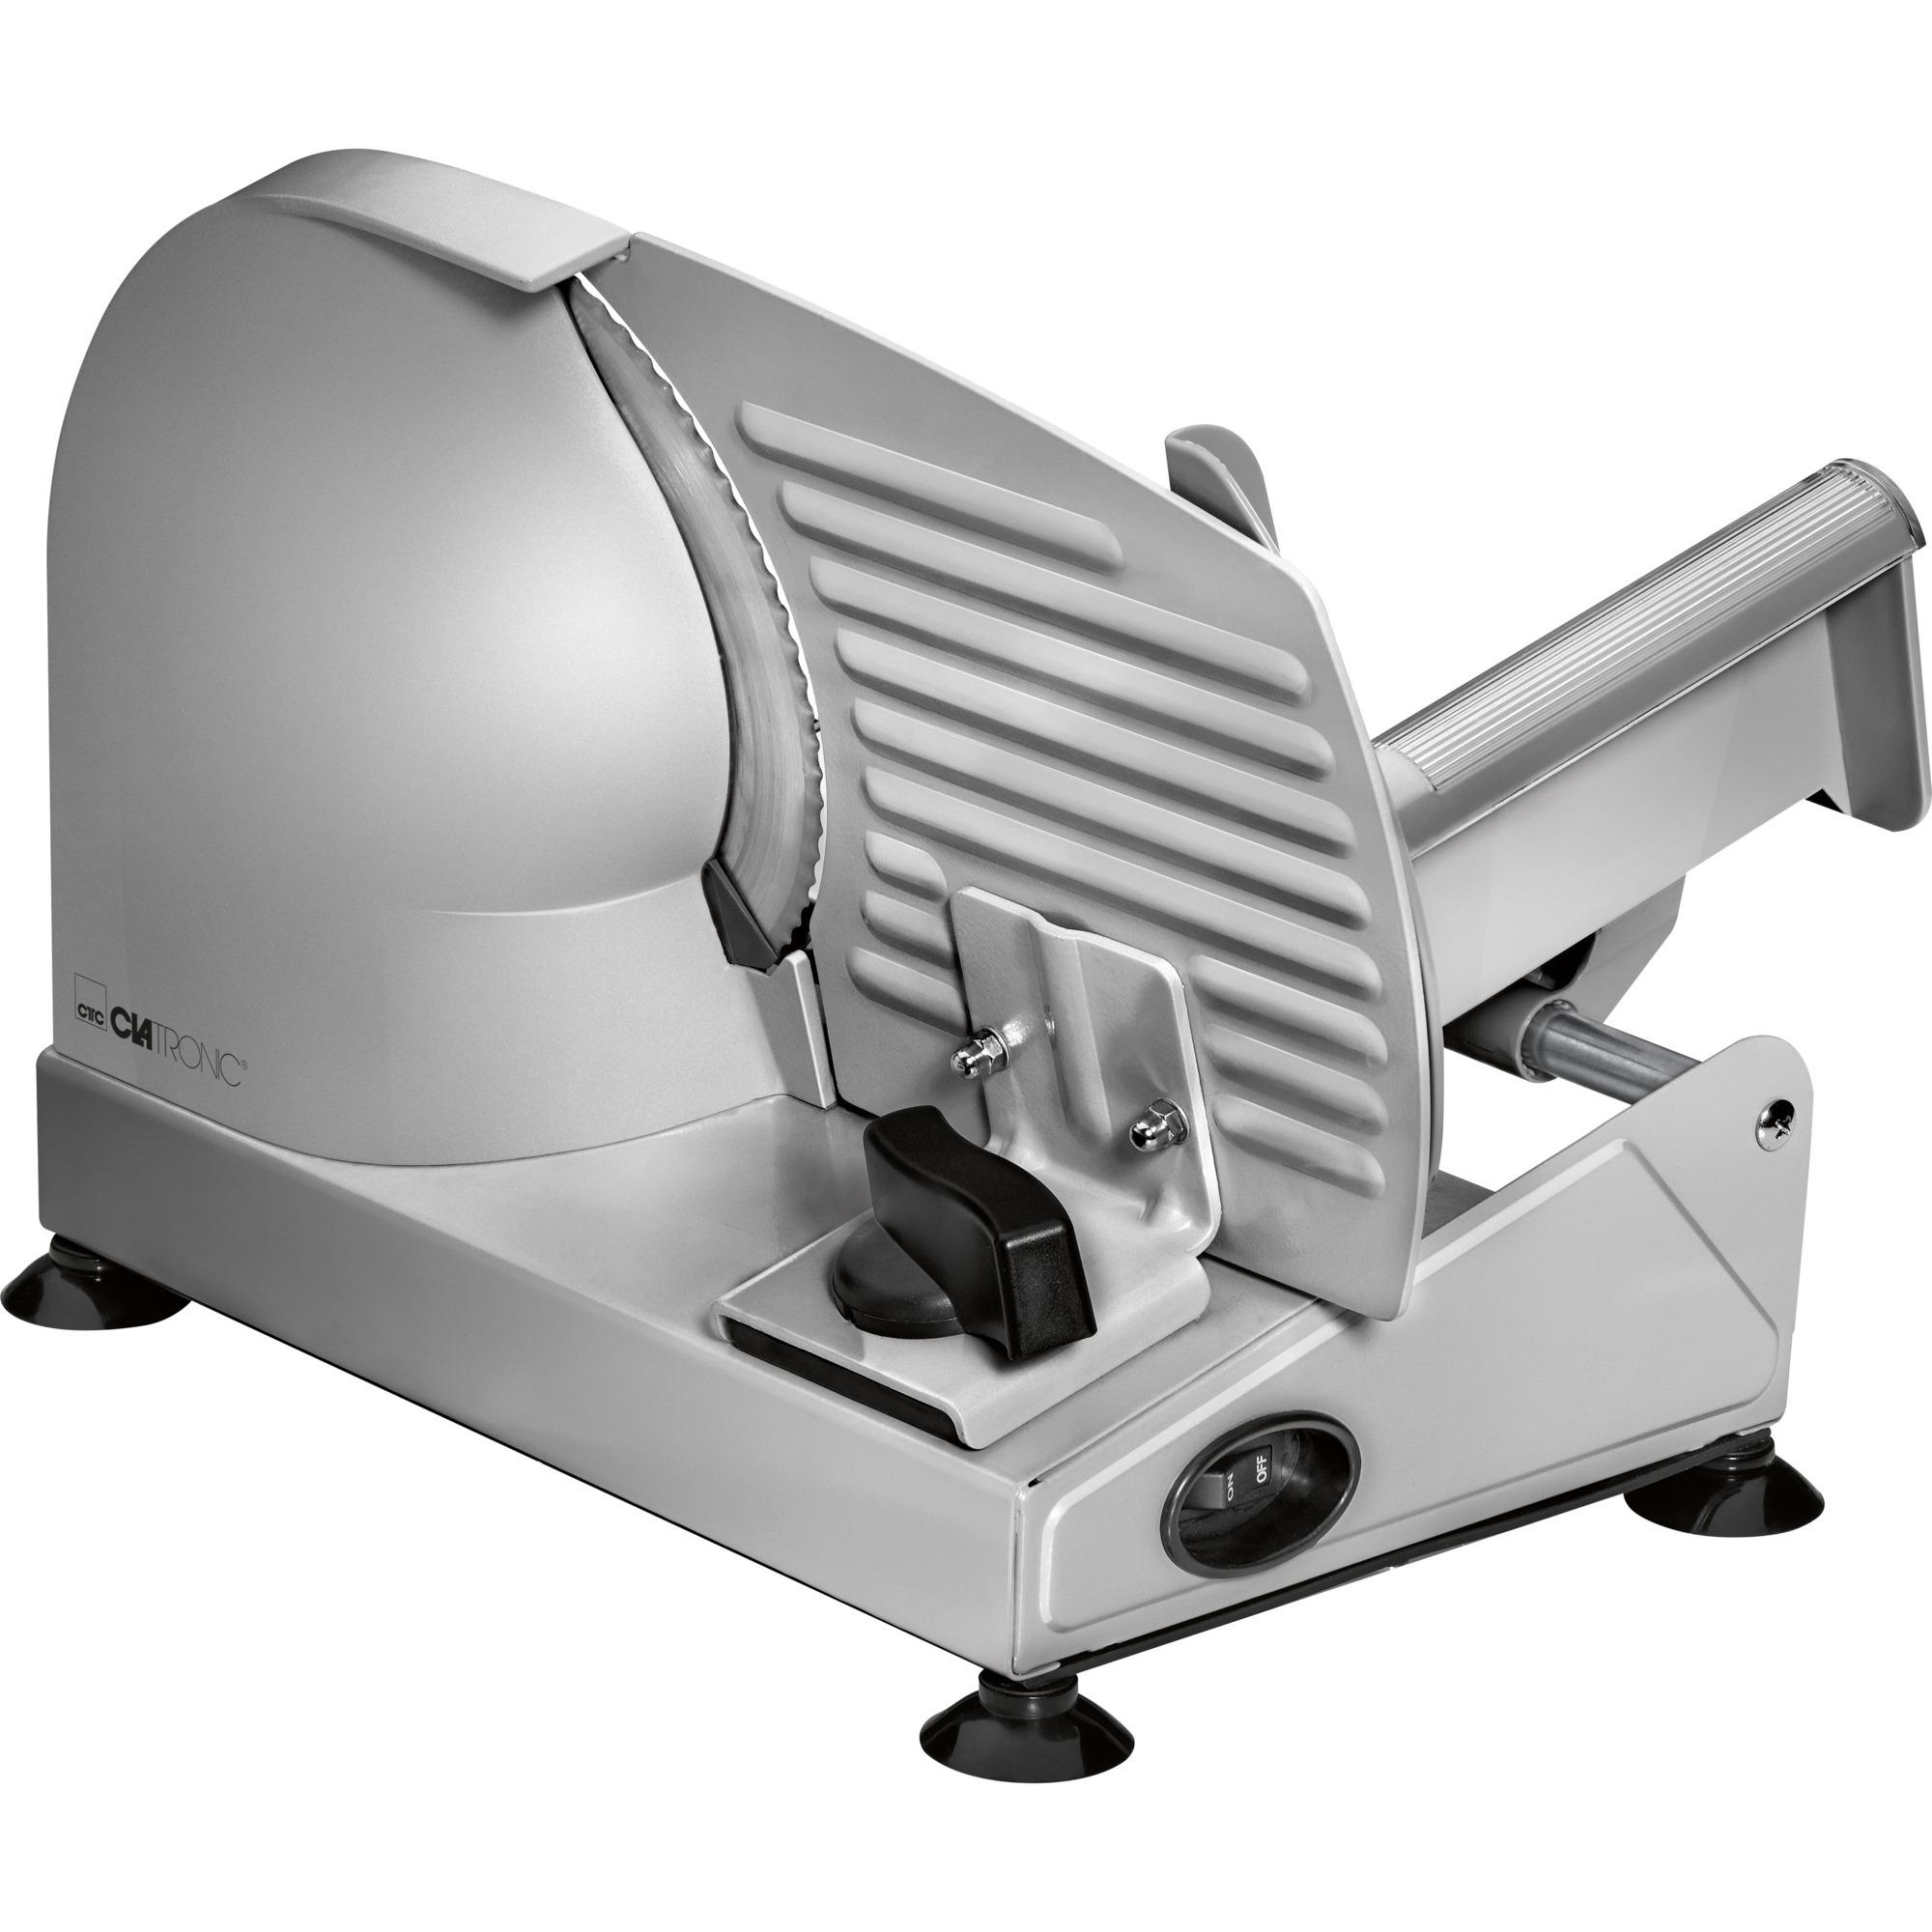 MA 3585 Eléctrico 150W Metal Metálico rebanadora, Cortatodo